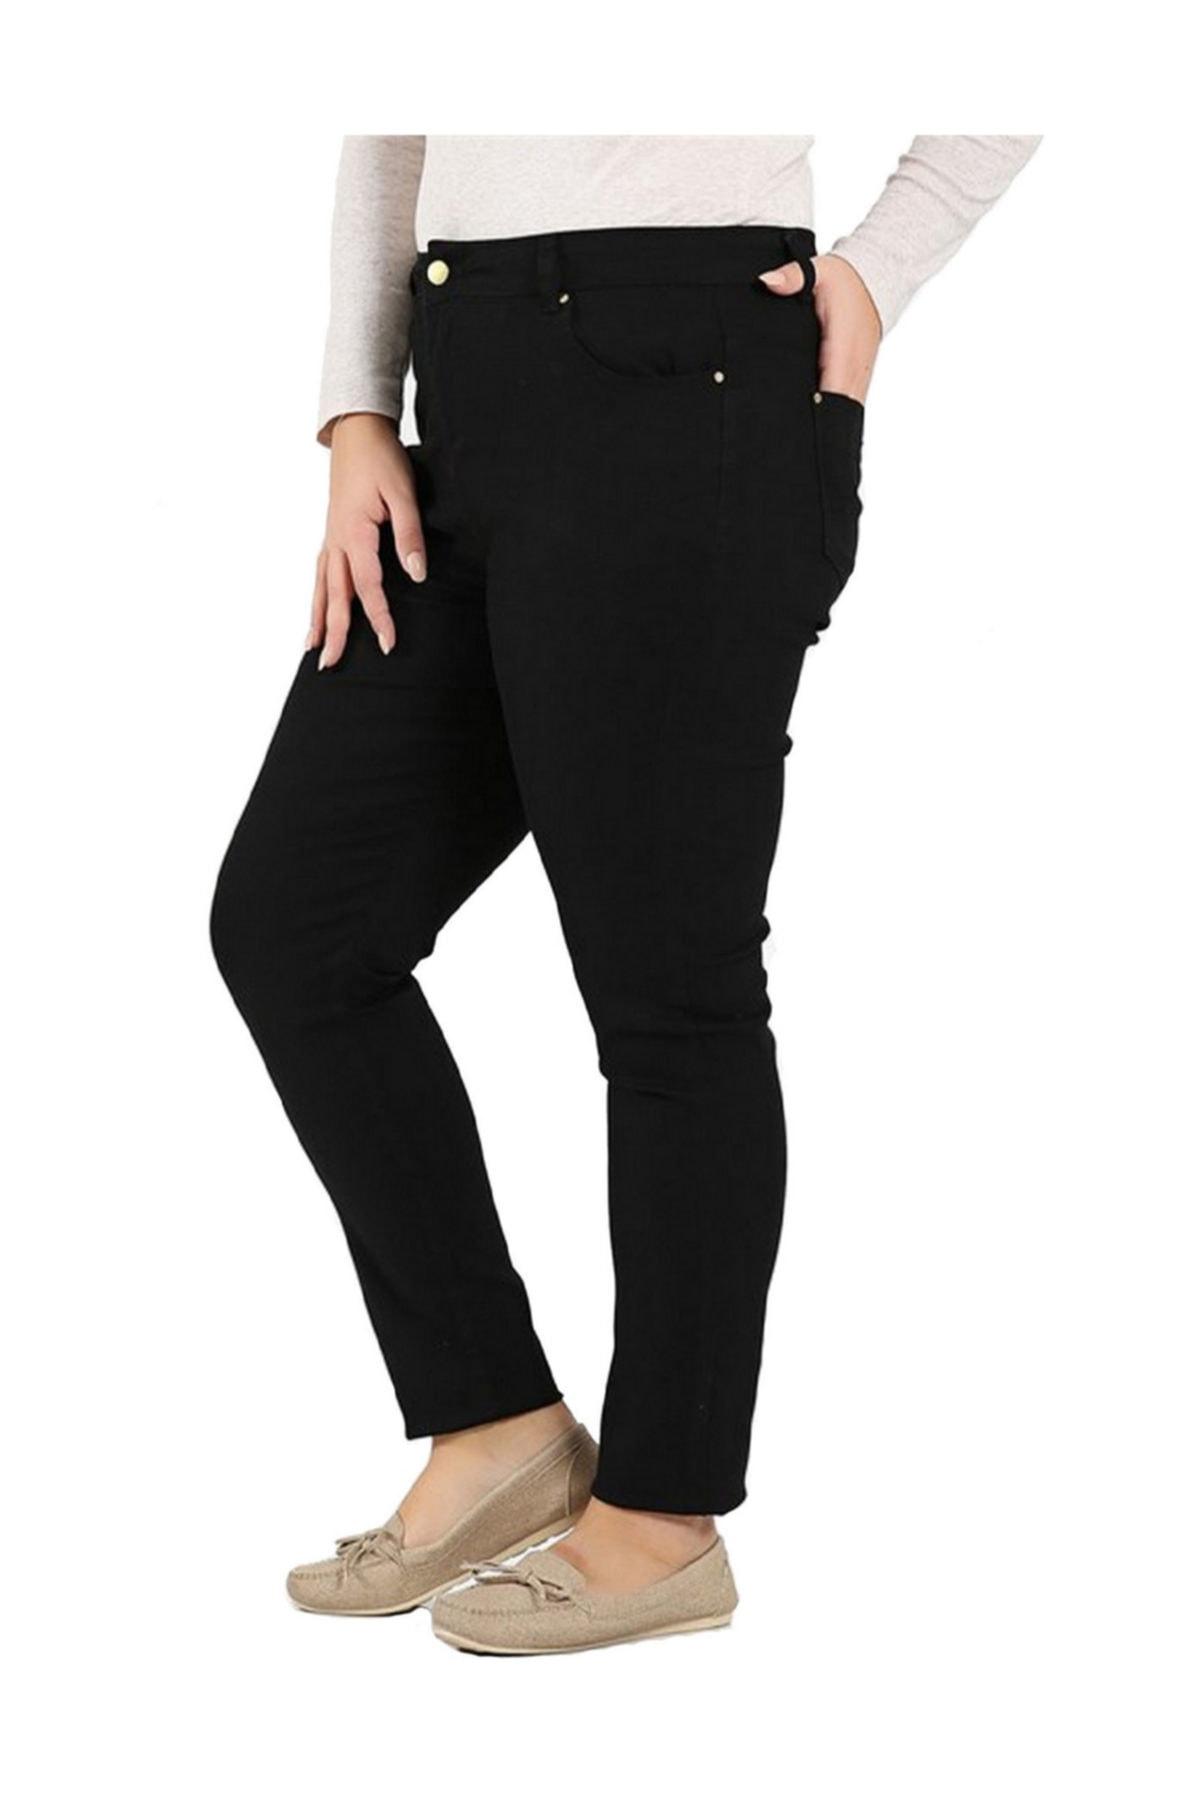 Kadın Siyah Kanvas Yüksek Bel Dar Paça Pantolon Rg1251p